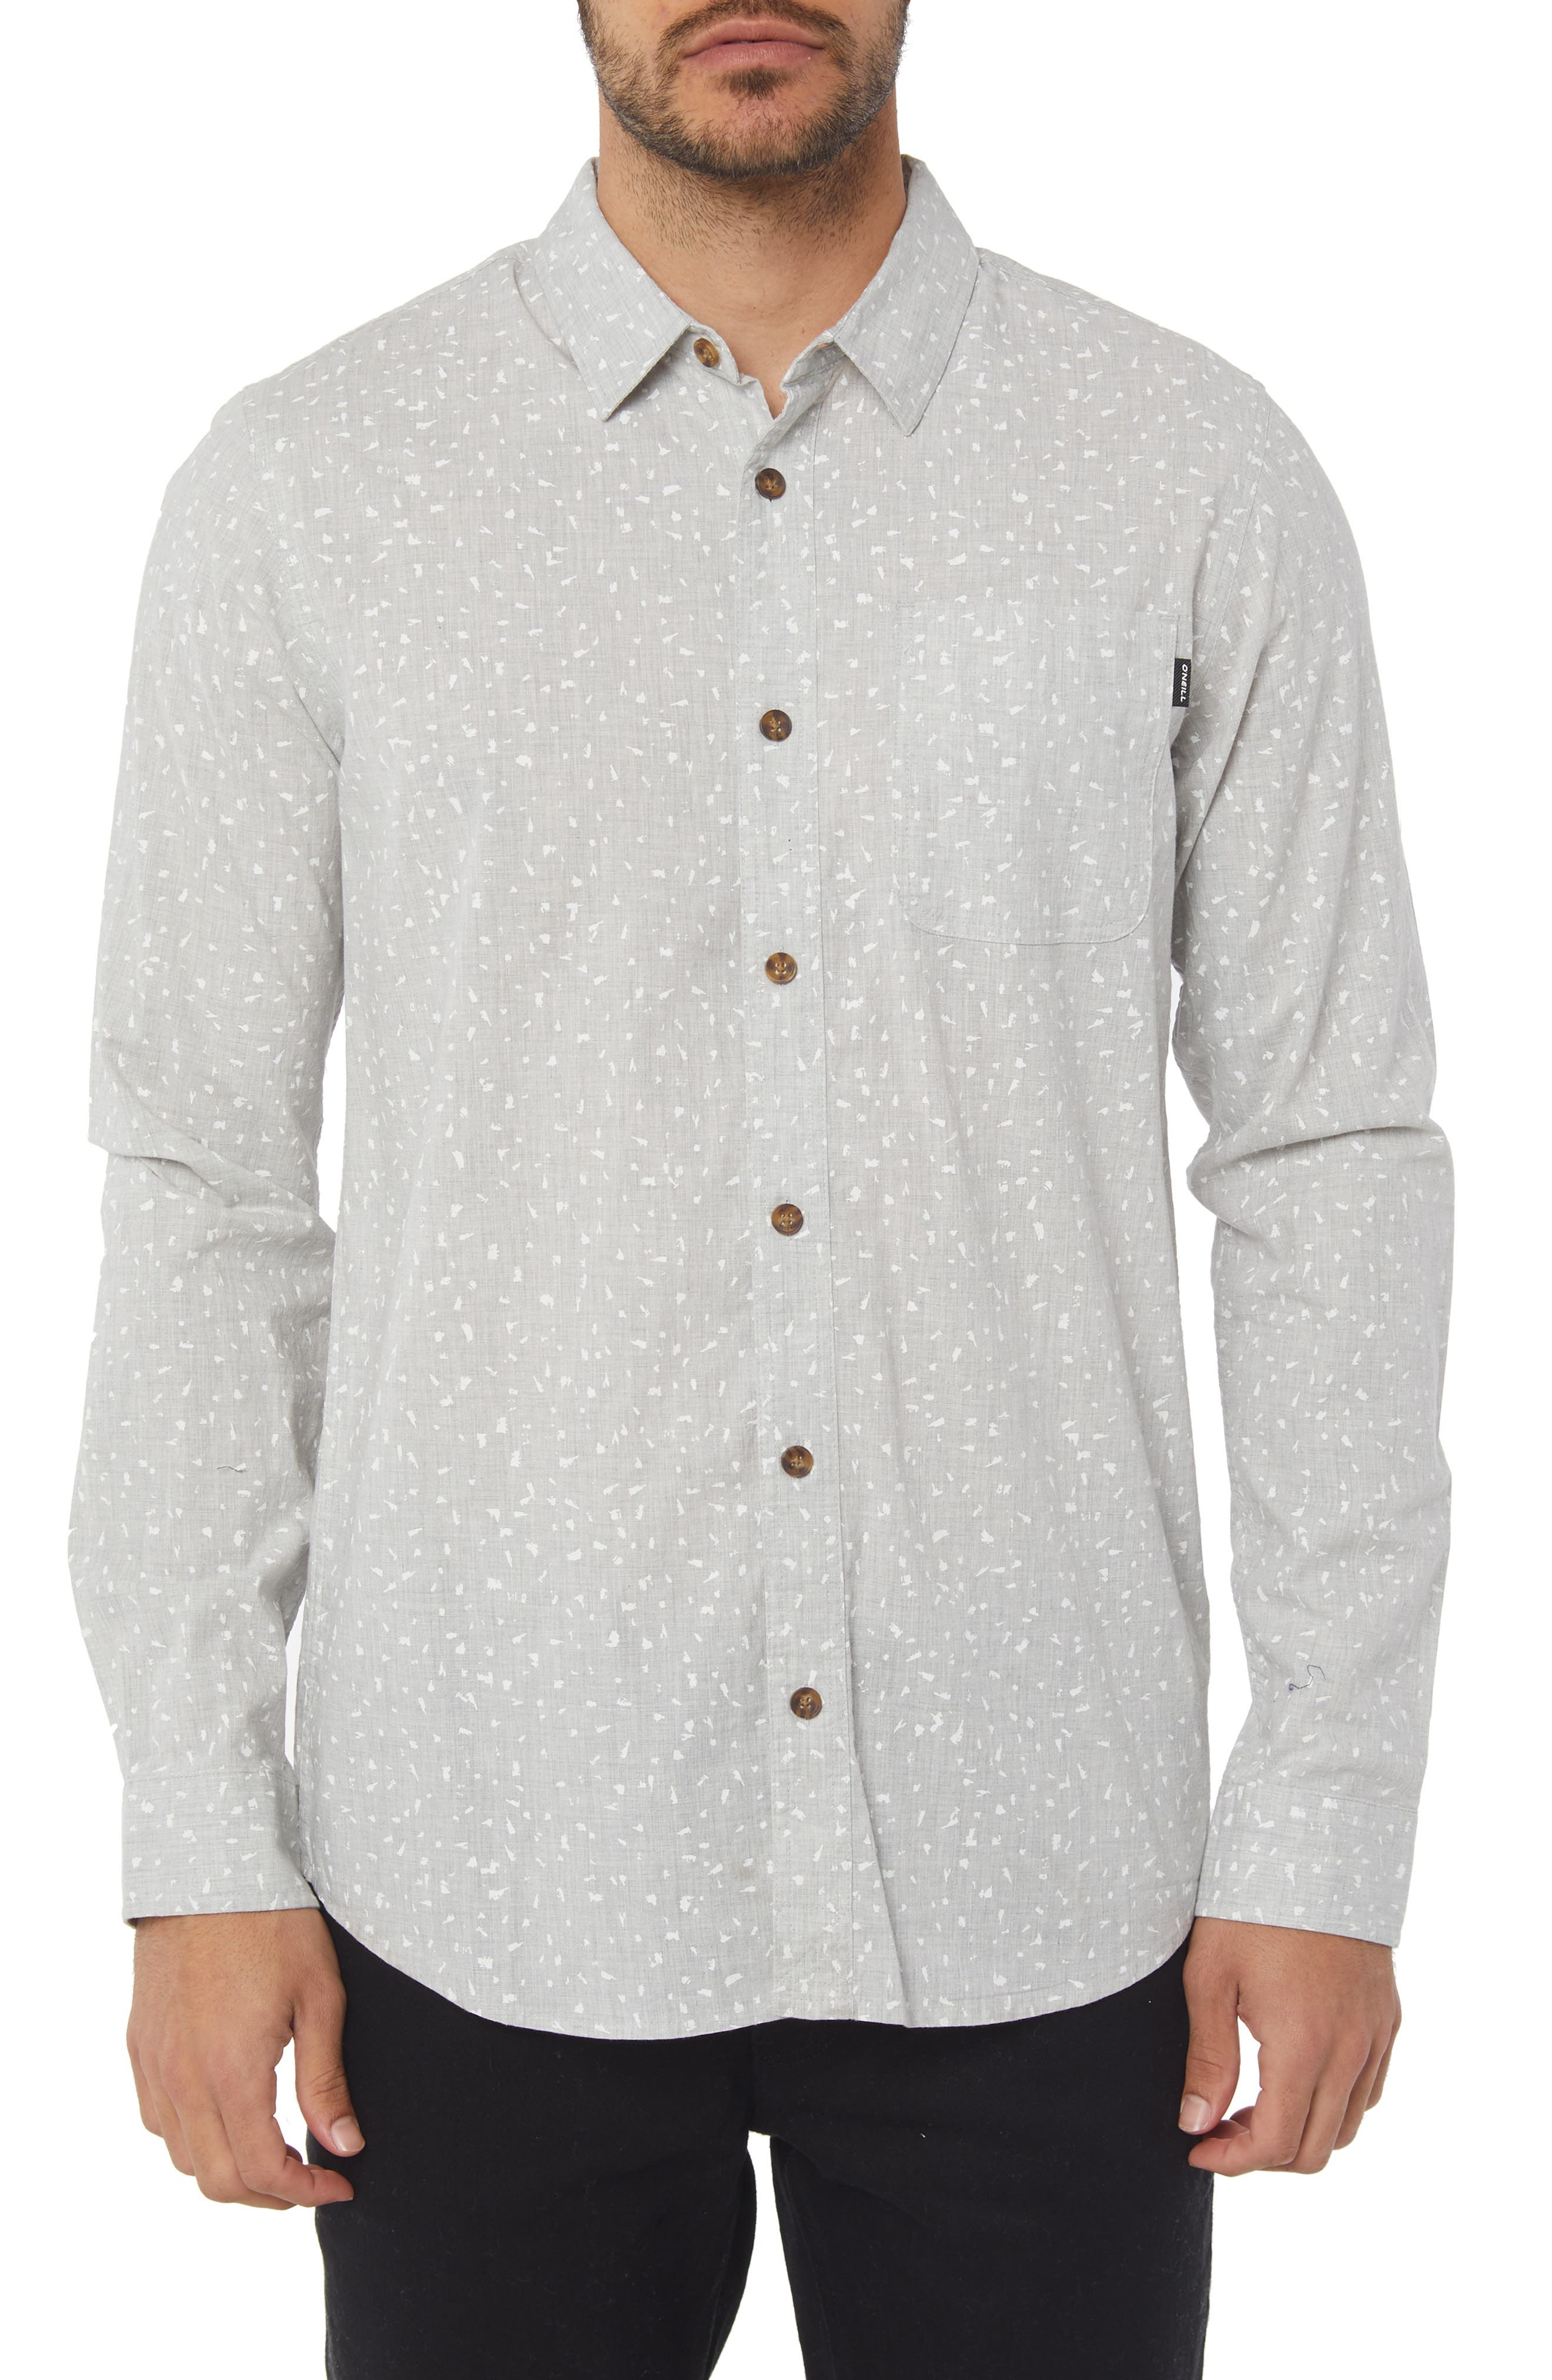 Phases Print Shirt,                         Main,                         color, LIGHT GREY